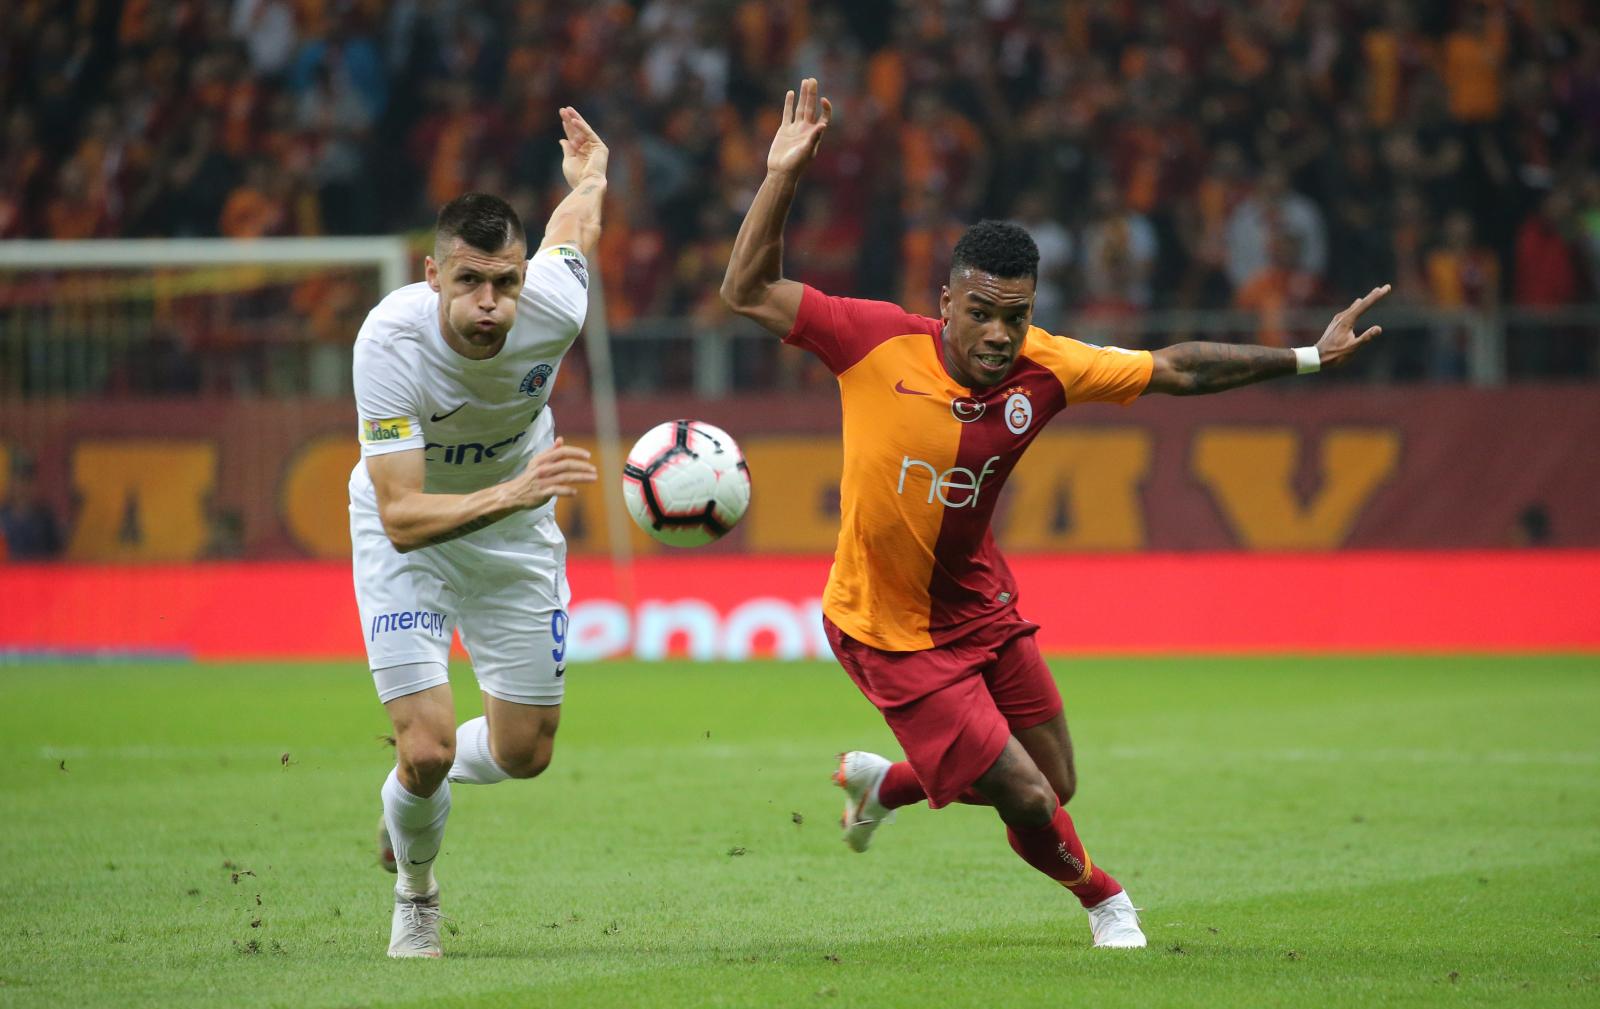 Касымпаша — Ризеспор: прогноз на матч 32-го тура Суперлиги